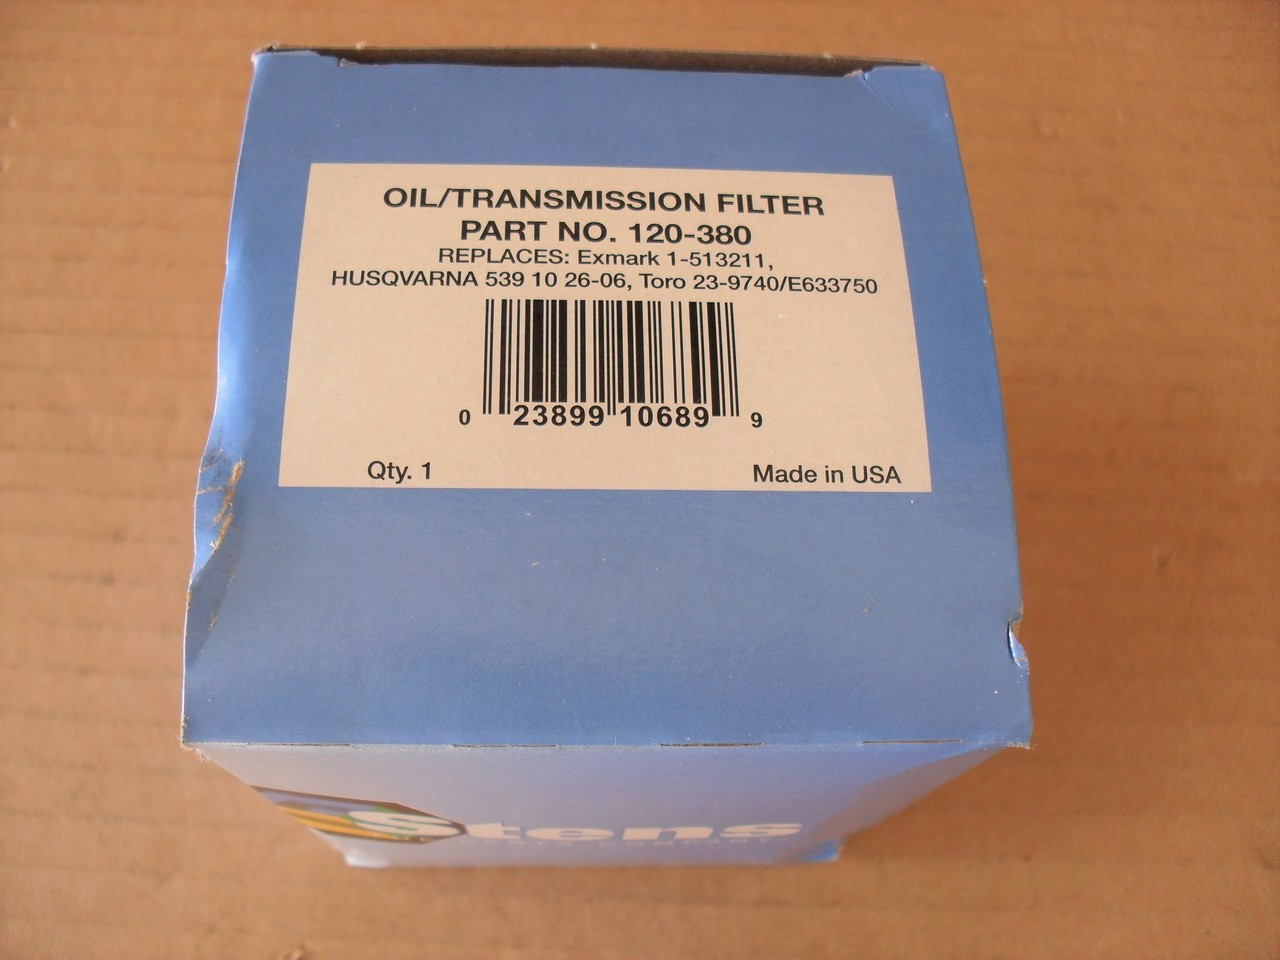 Husqvarna Hydraulic Transmission Oil Filter 531 30 73-94, 531307394, 539 10  26-06, 539102606 Hydro, Made In USA